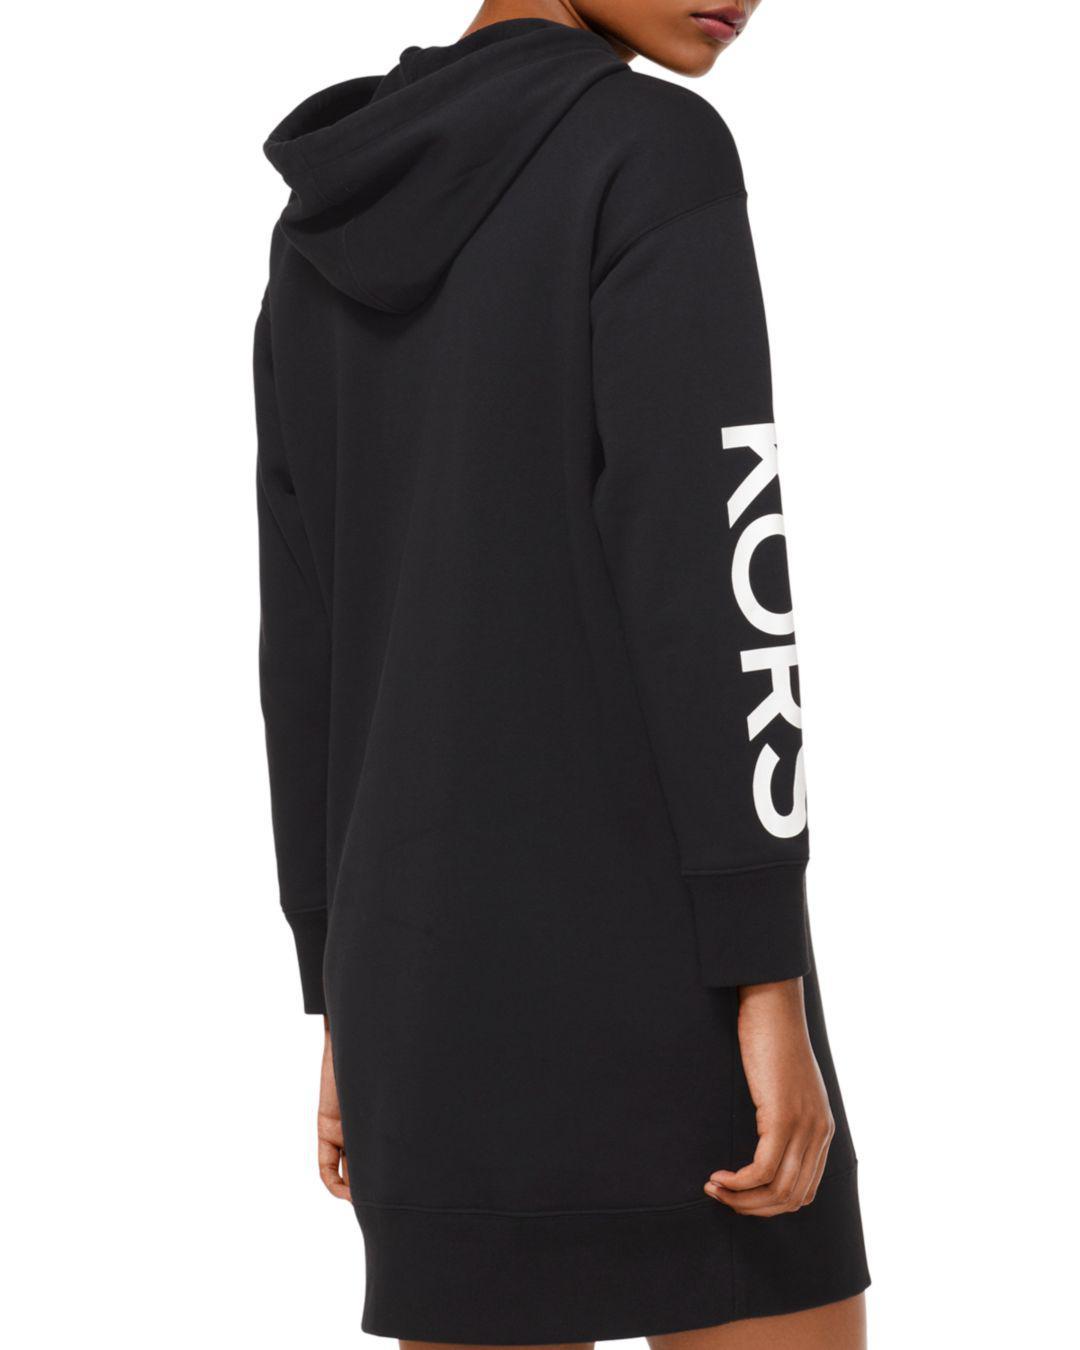 f364b733e78 MICHAEL Michael Kors Studded Logo Sweatshirt Dress in Black - Lyst